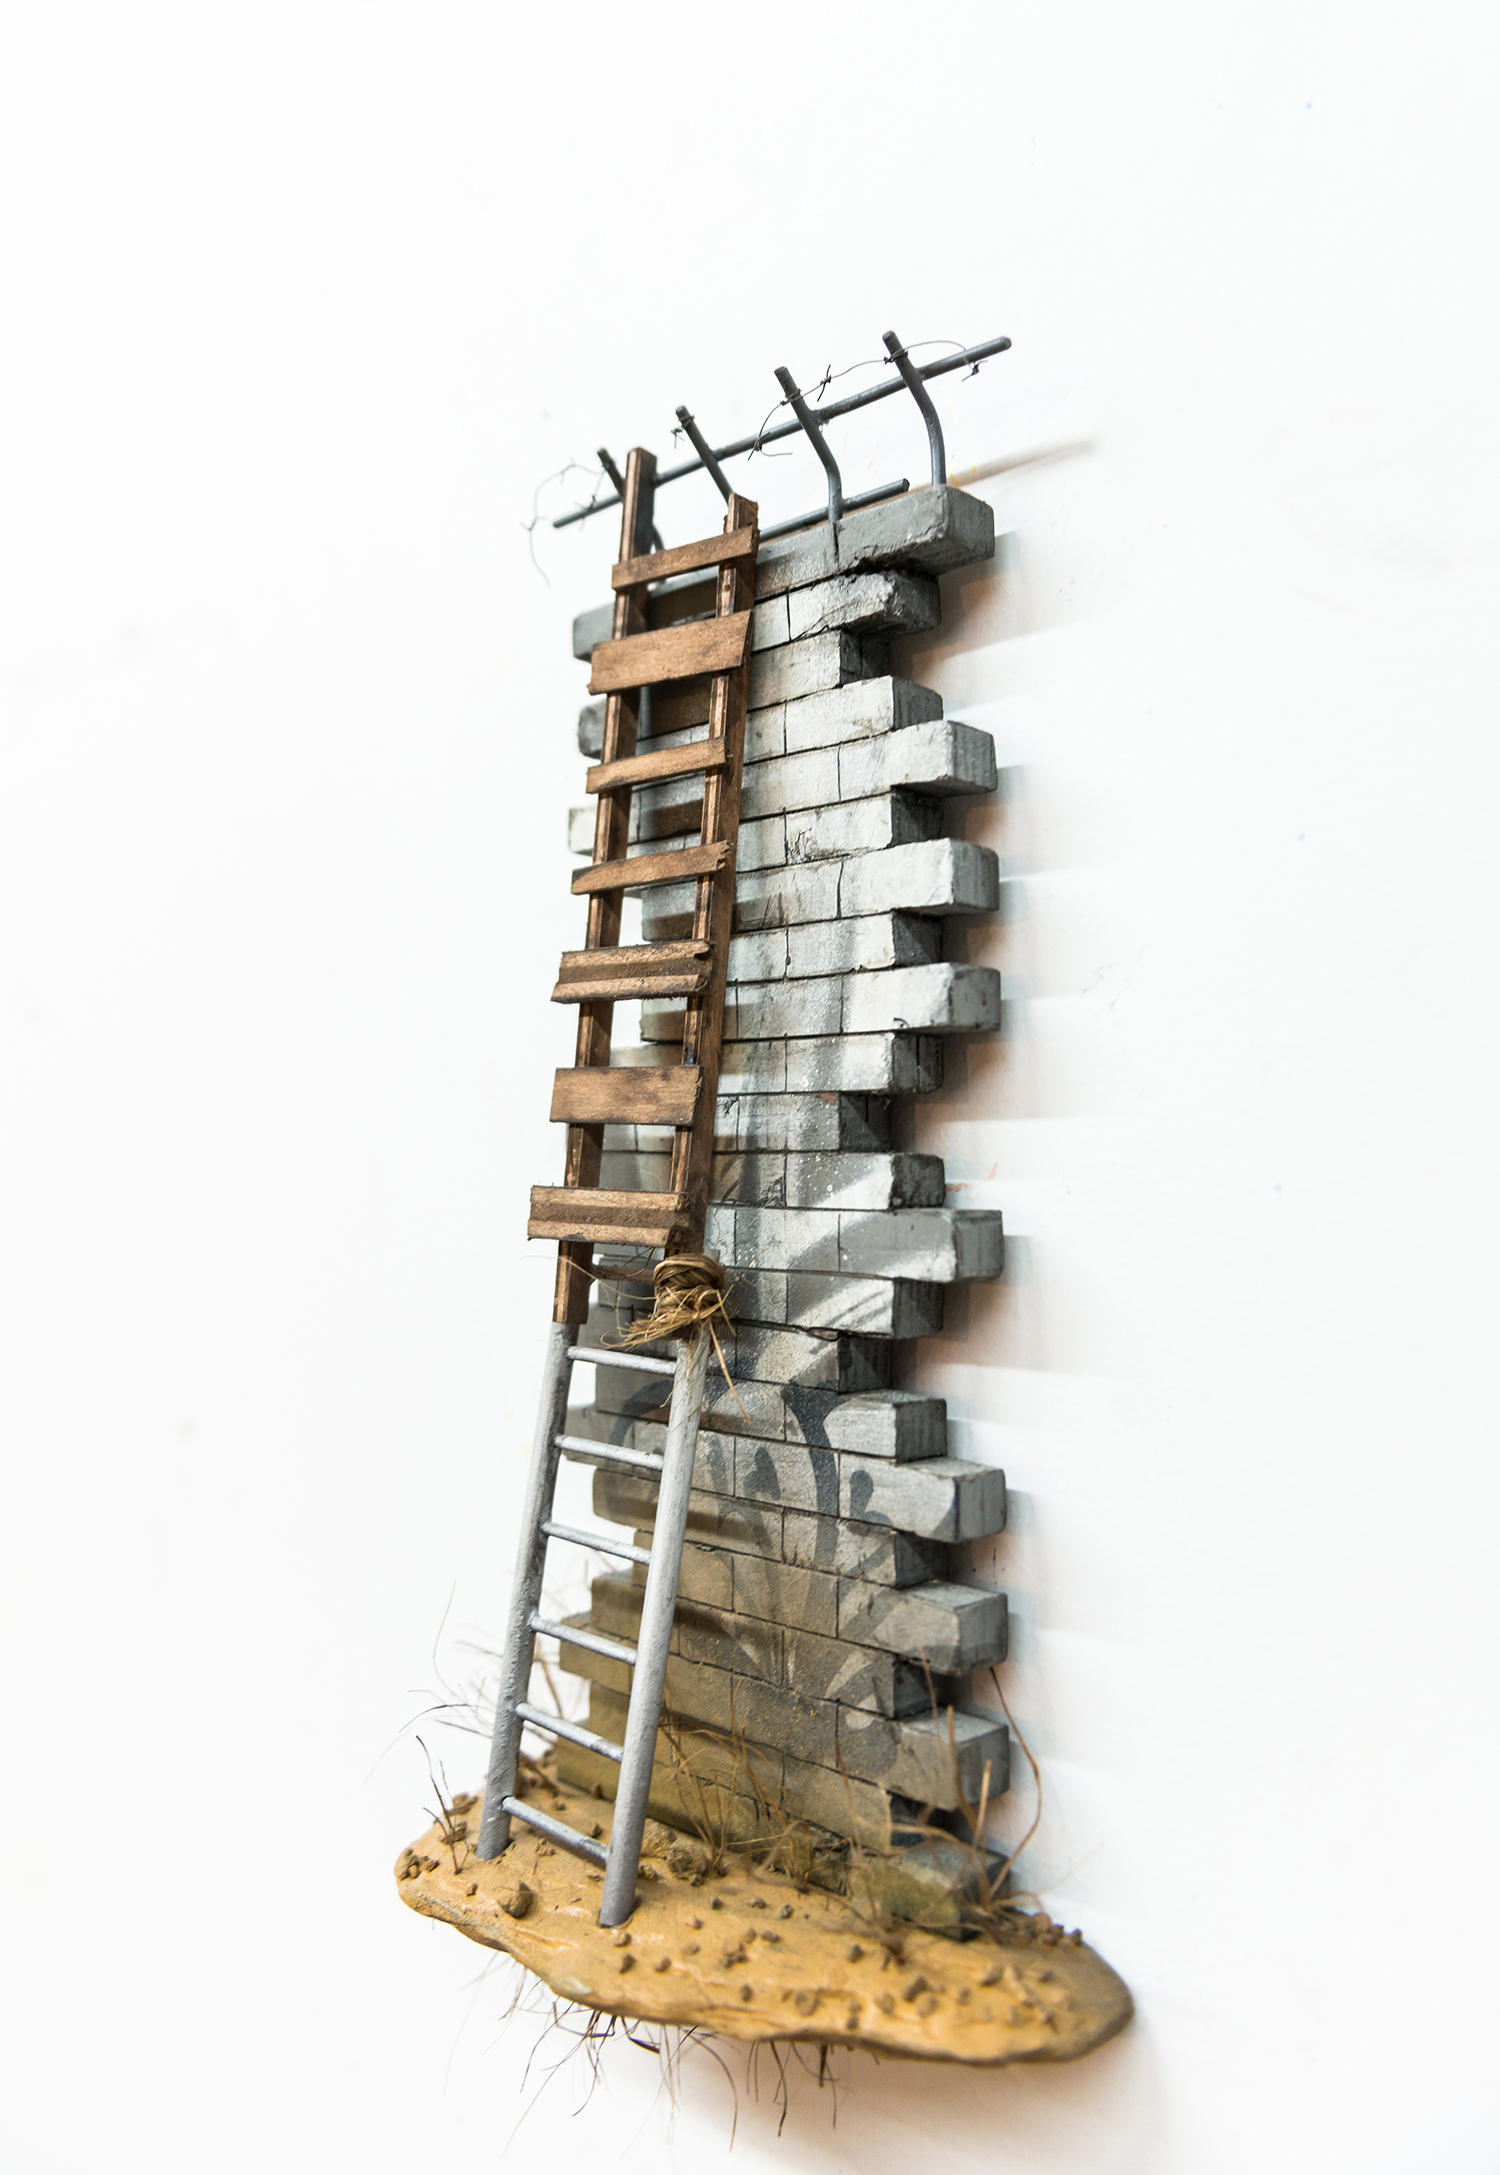 christopher-konecki-Walls-2.jpg